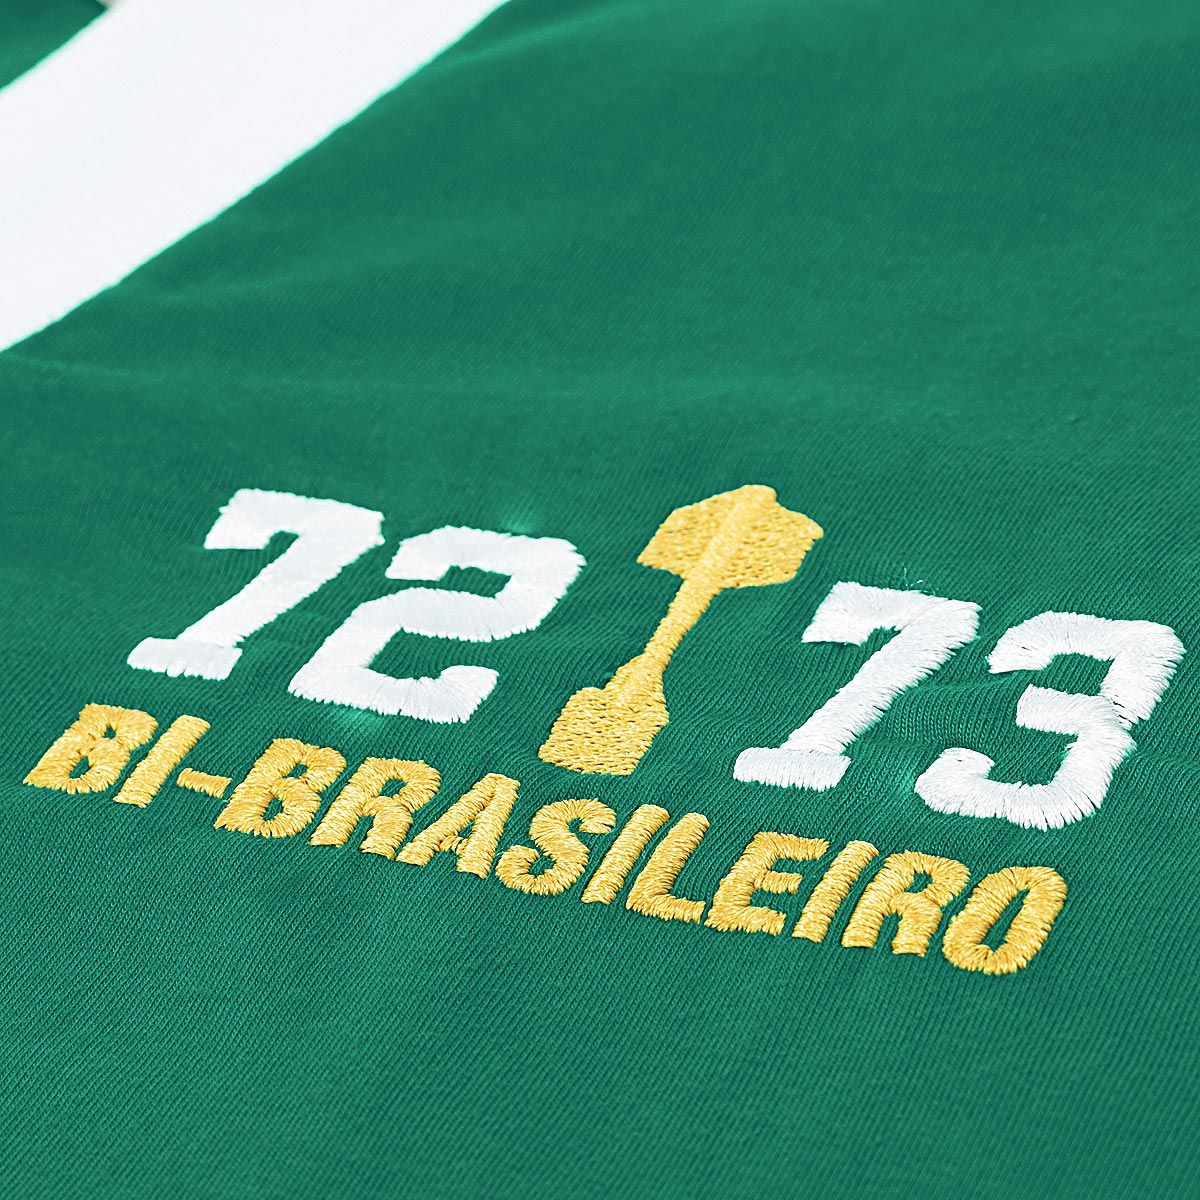 Camisa Palmeiras Retrô Gol Ademir Anos 70 Masculina